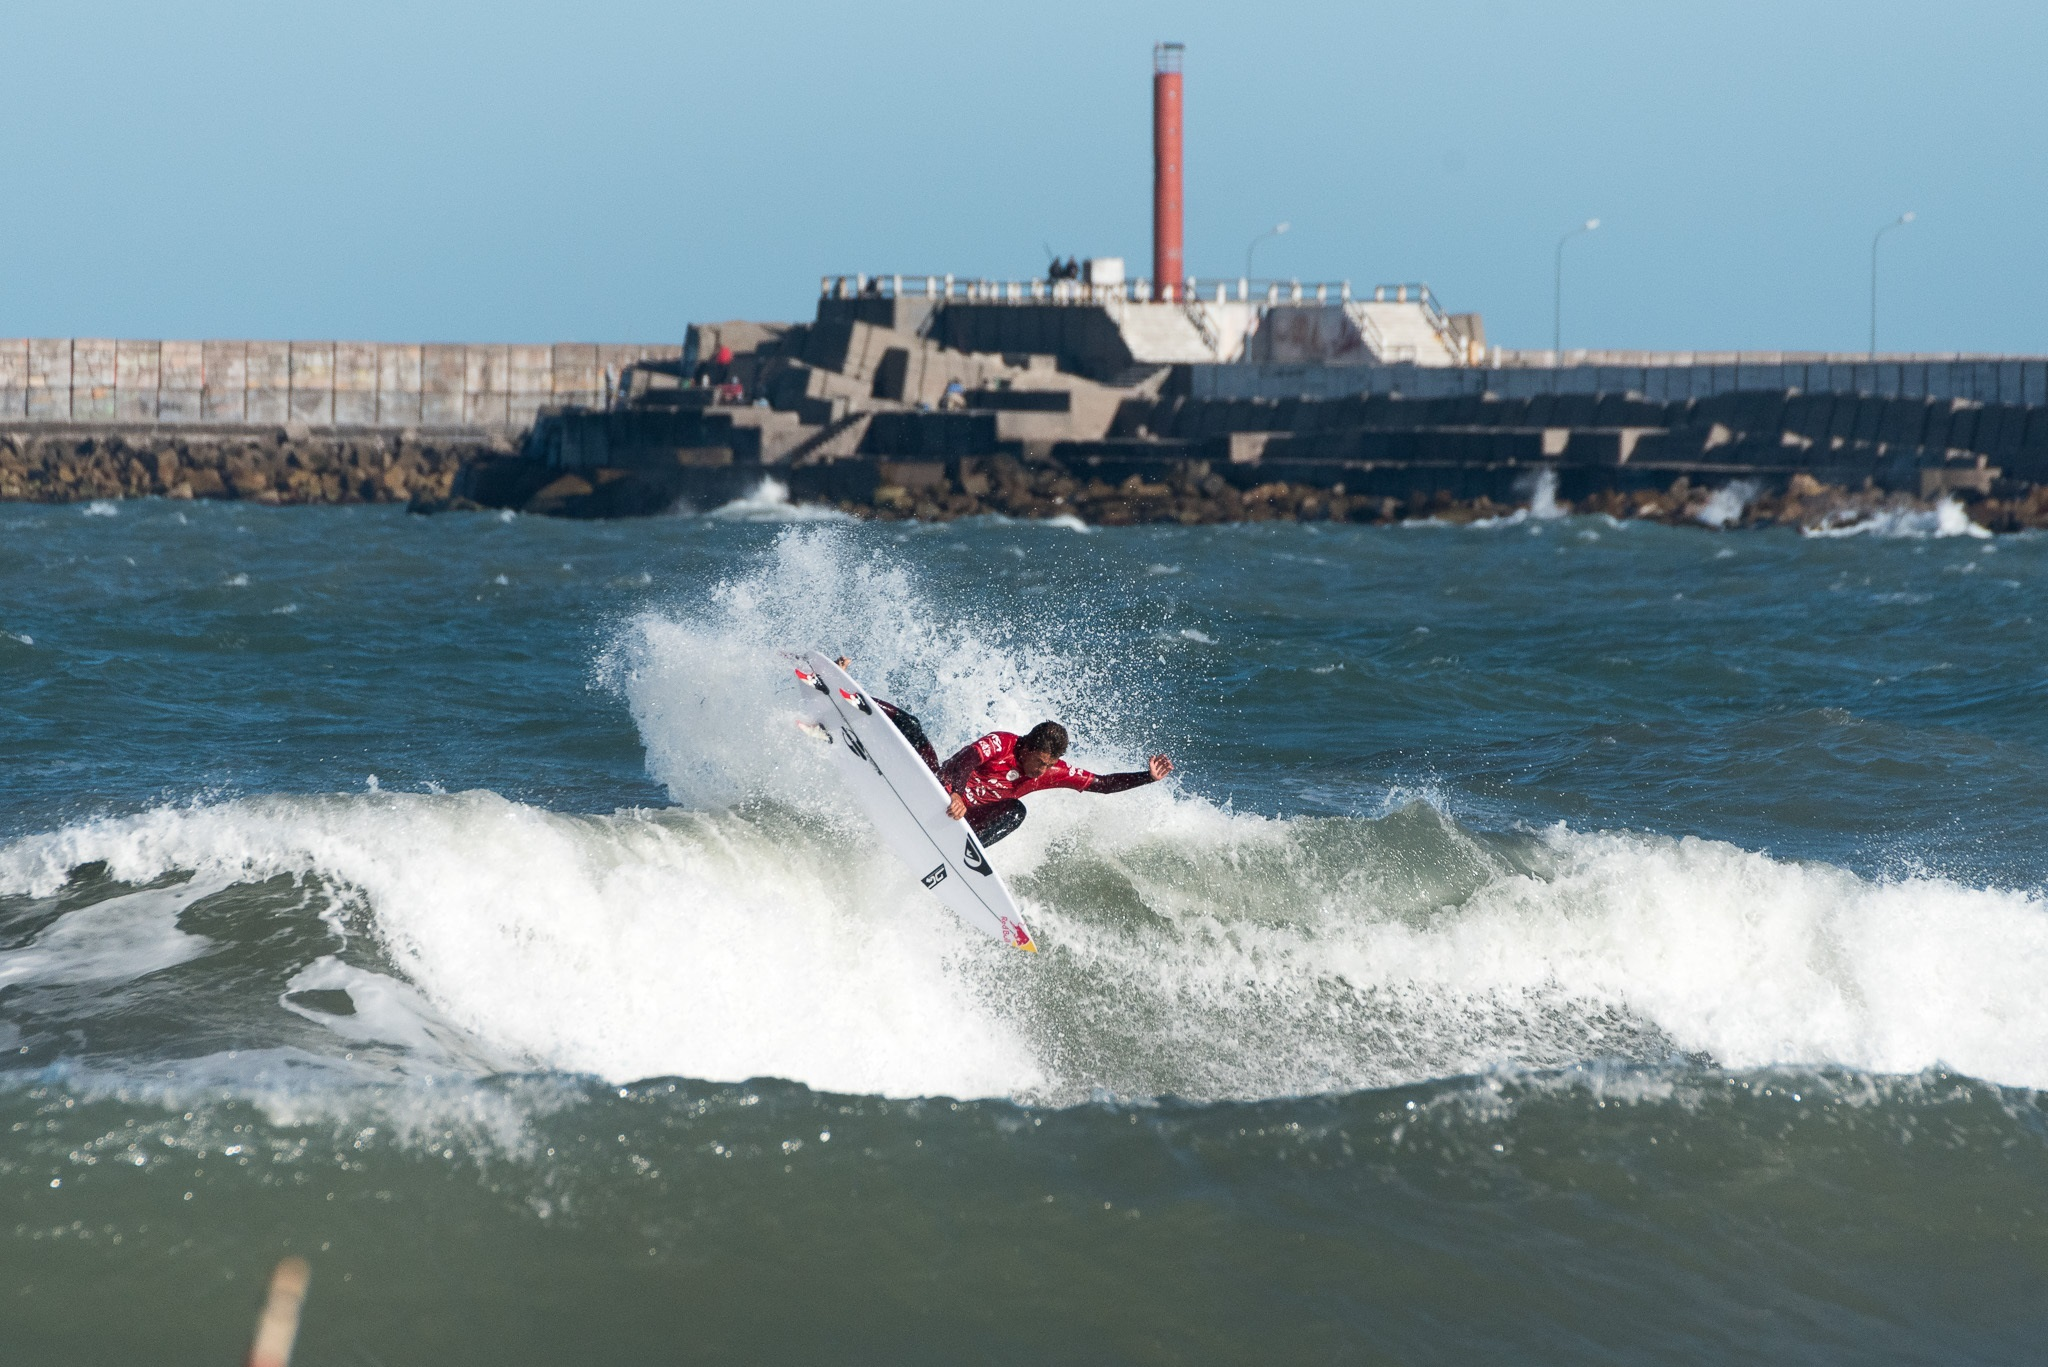 Mateus Herdy no QS de Mar Del Plata (ARG). / Foto: Beto Oviedo